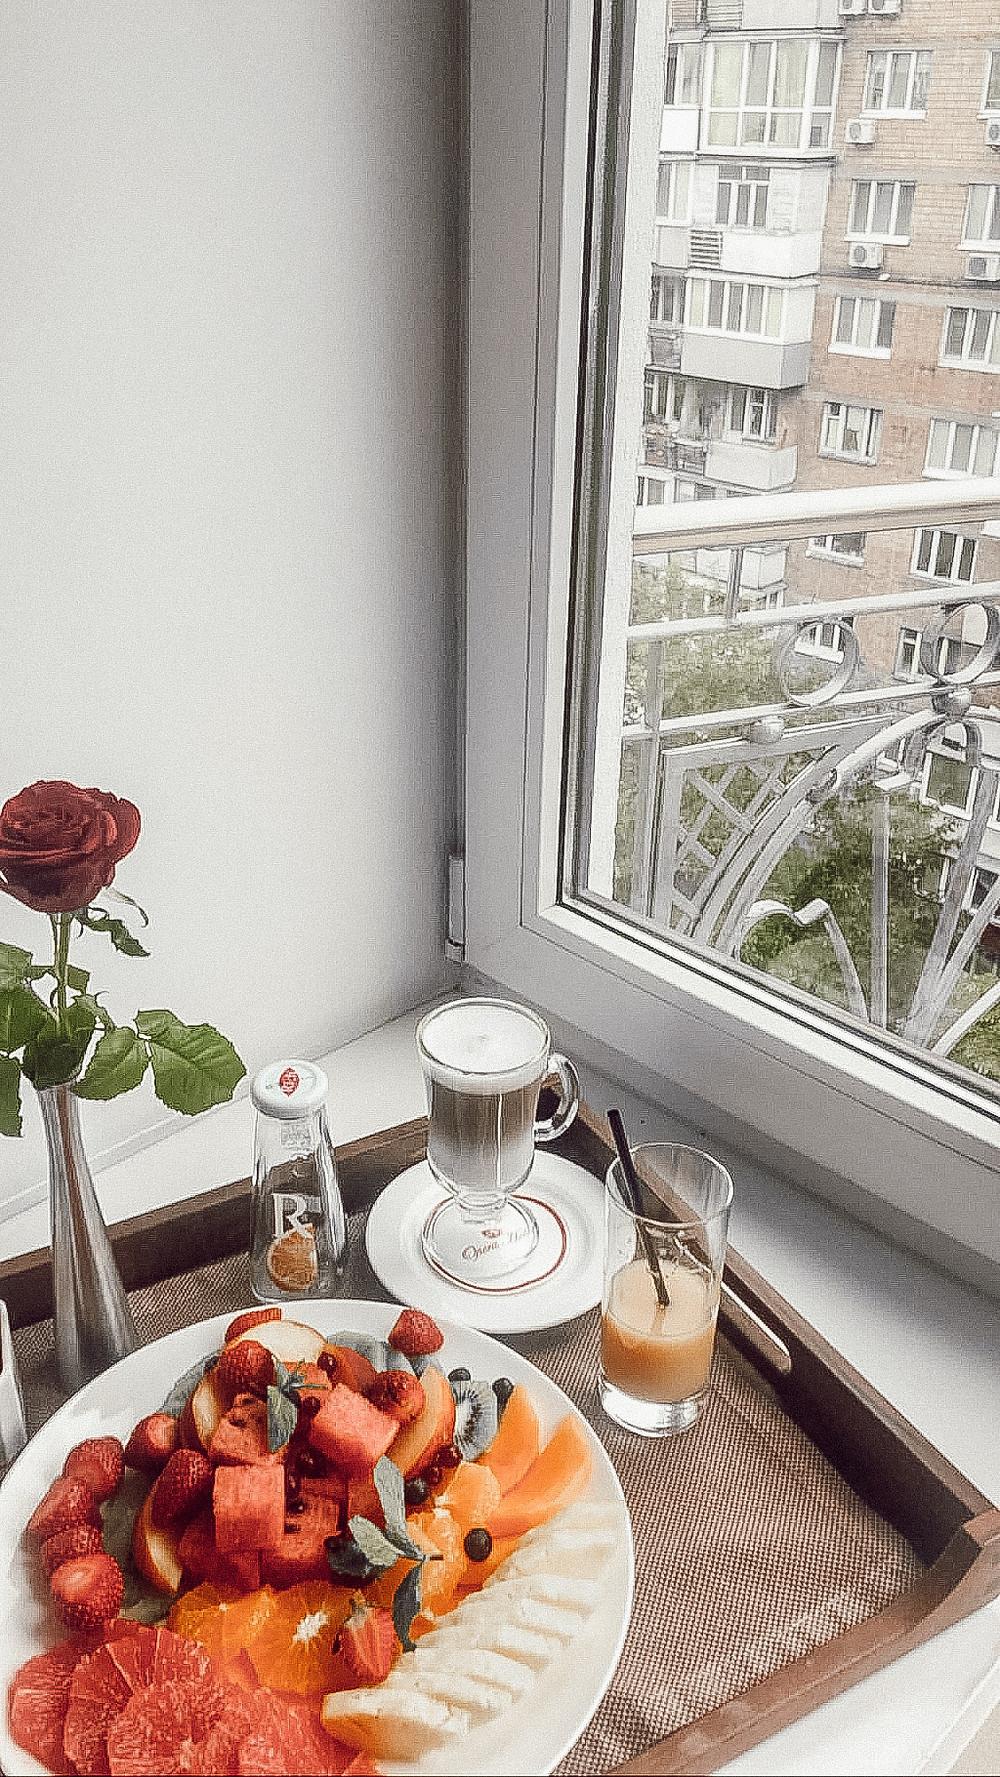 Cafe Latte, Opera Hotel, Kyiv, Ukraine